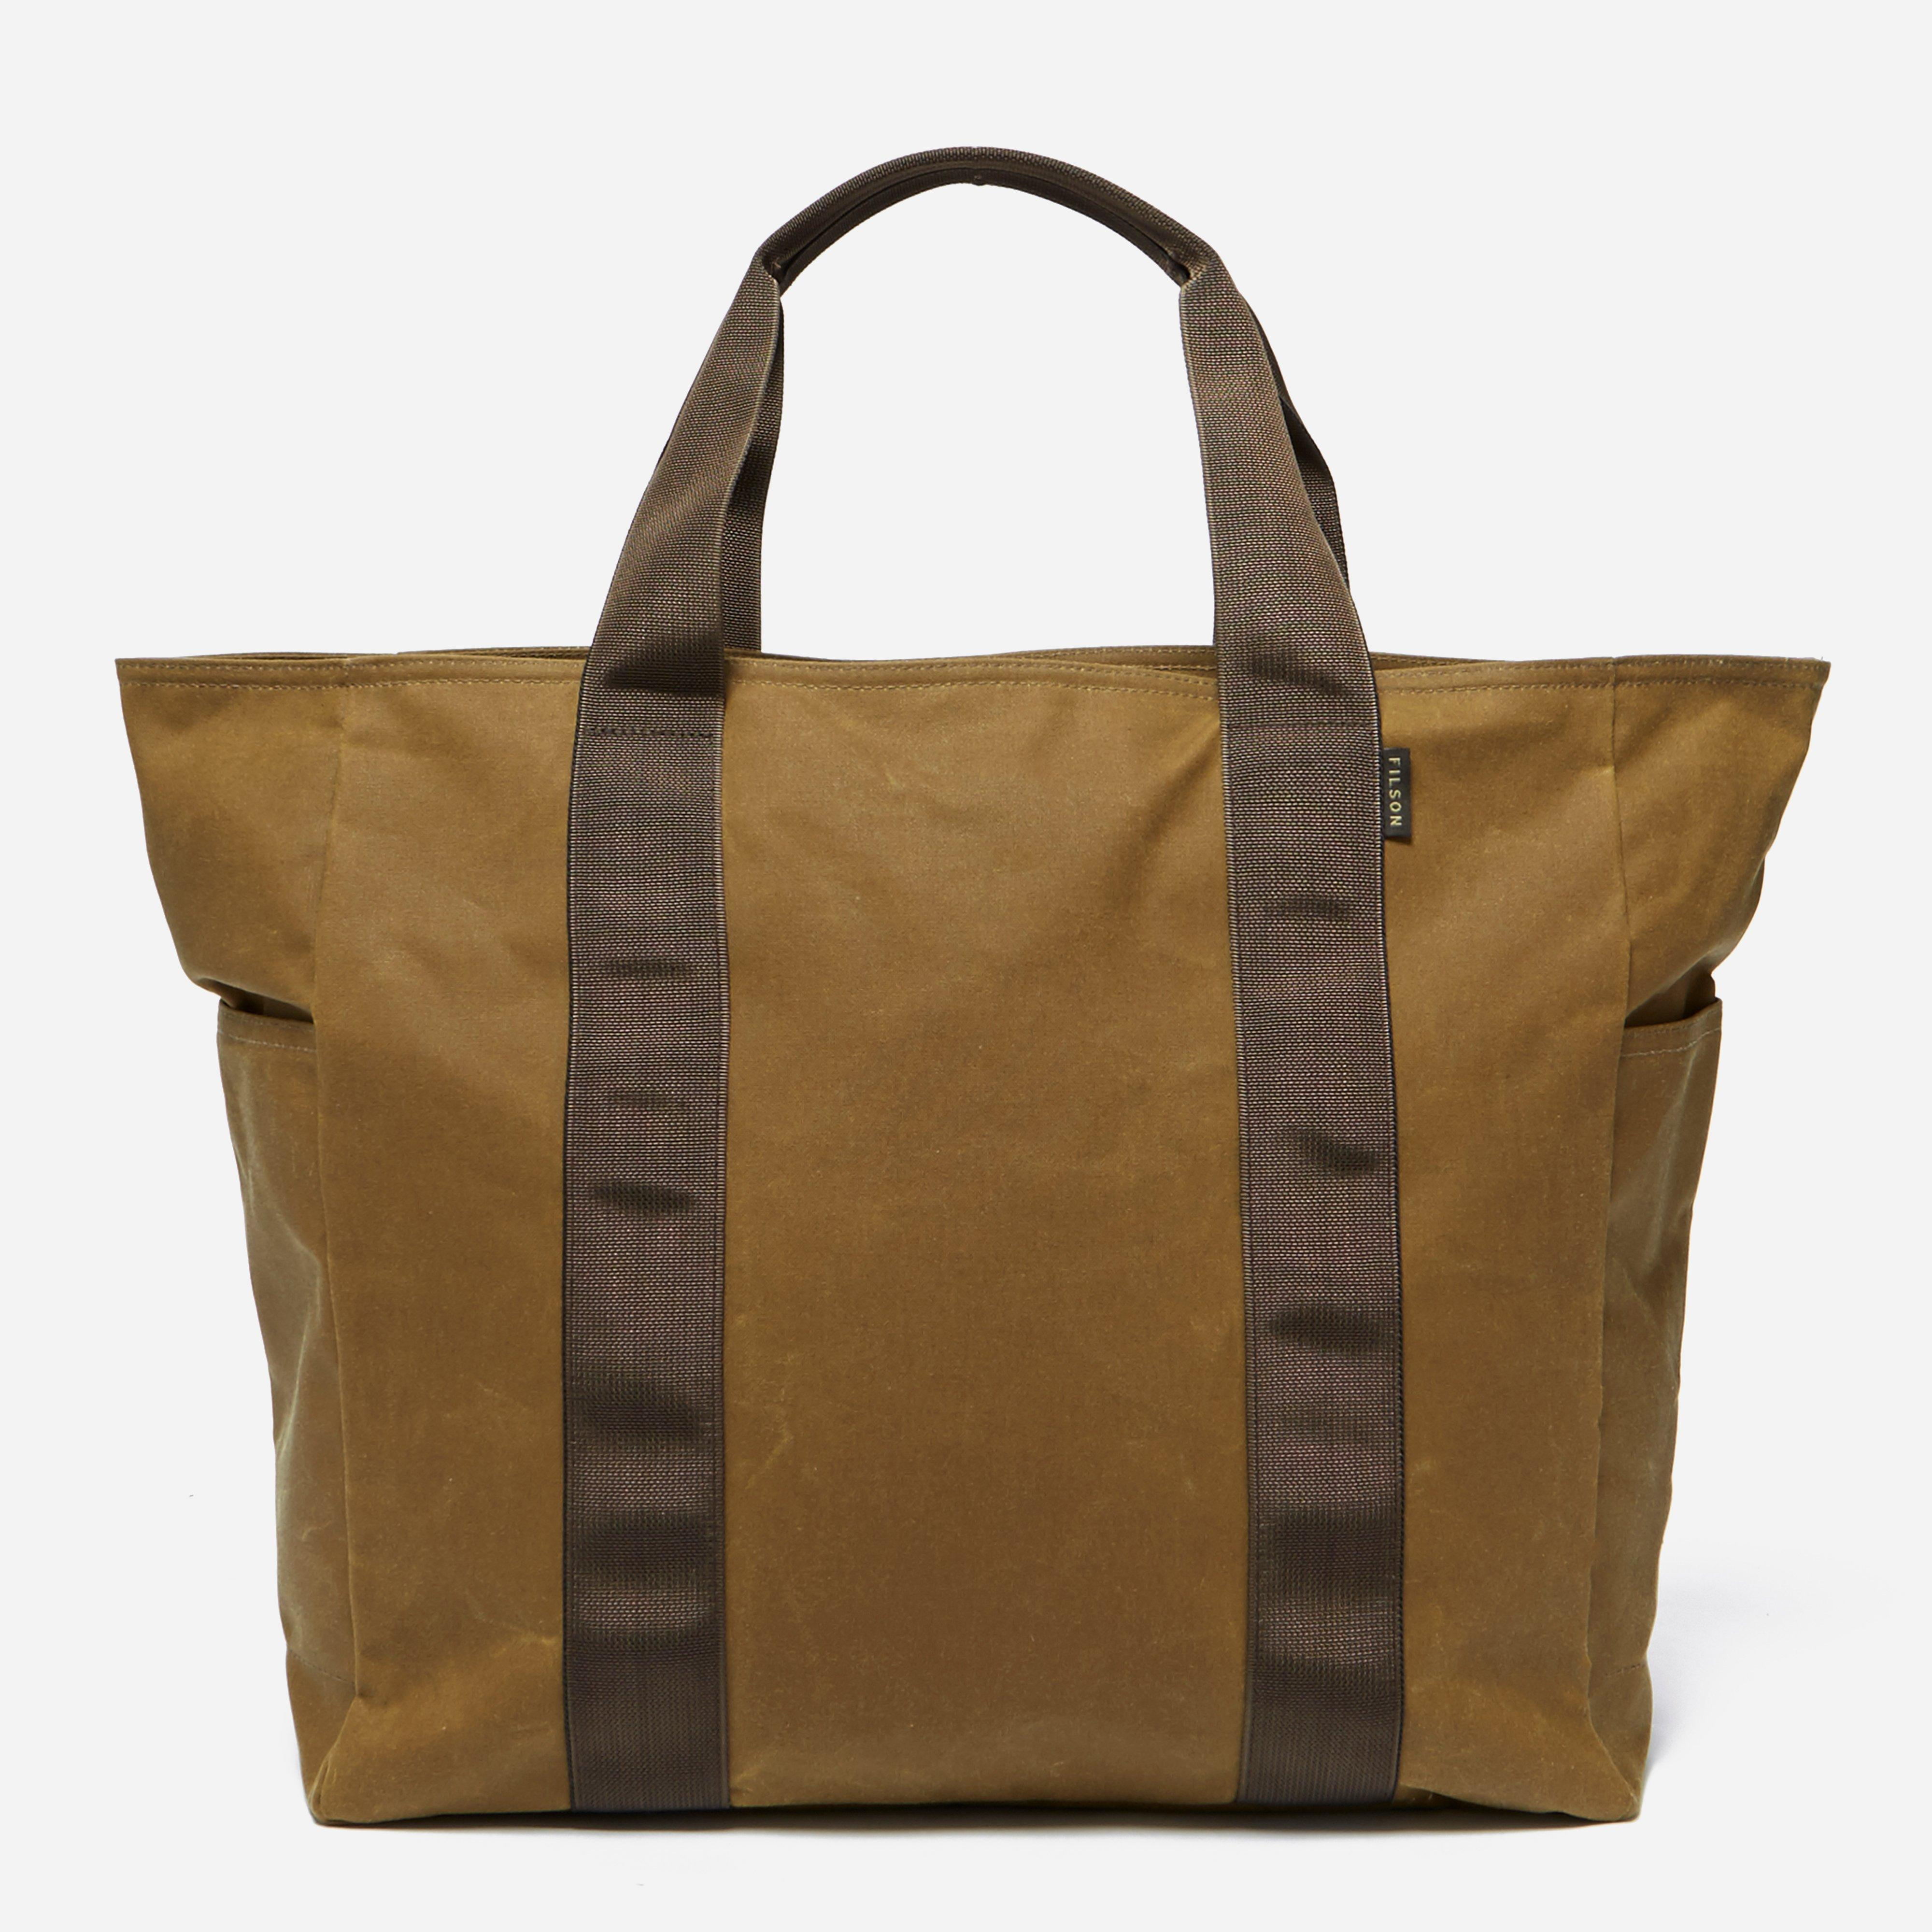 Filson Grab N Go Tote Bag